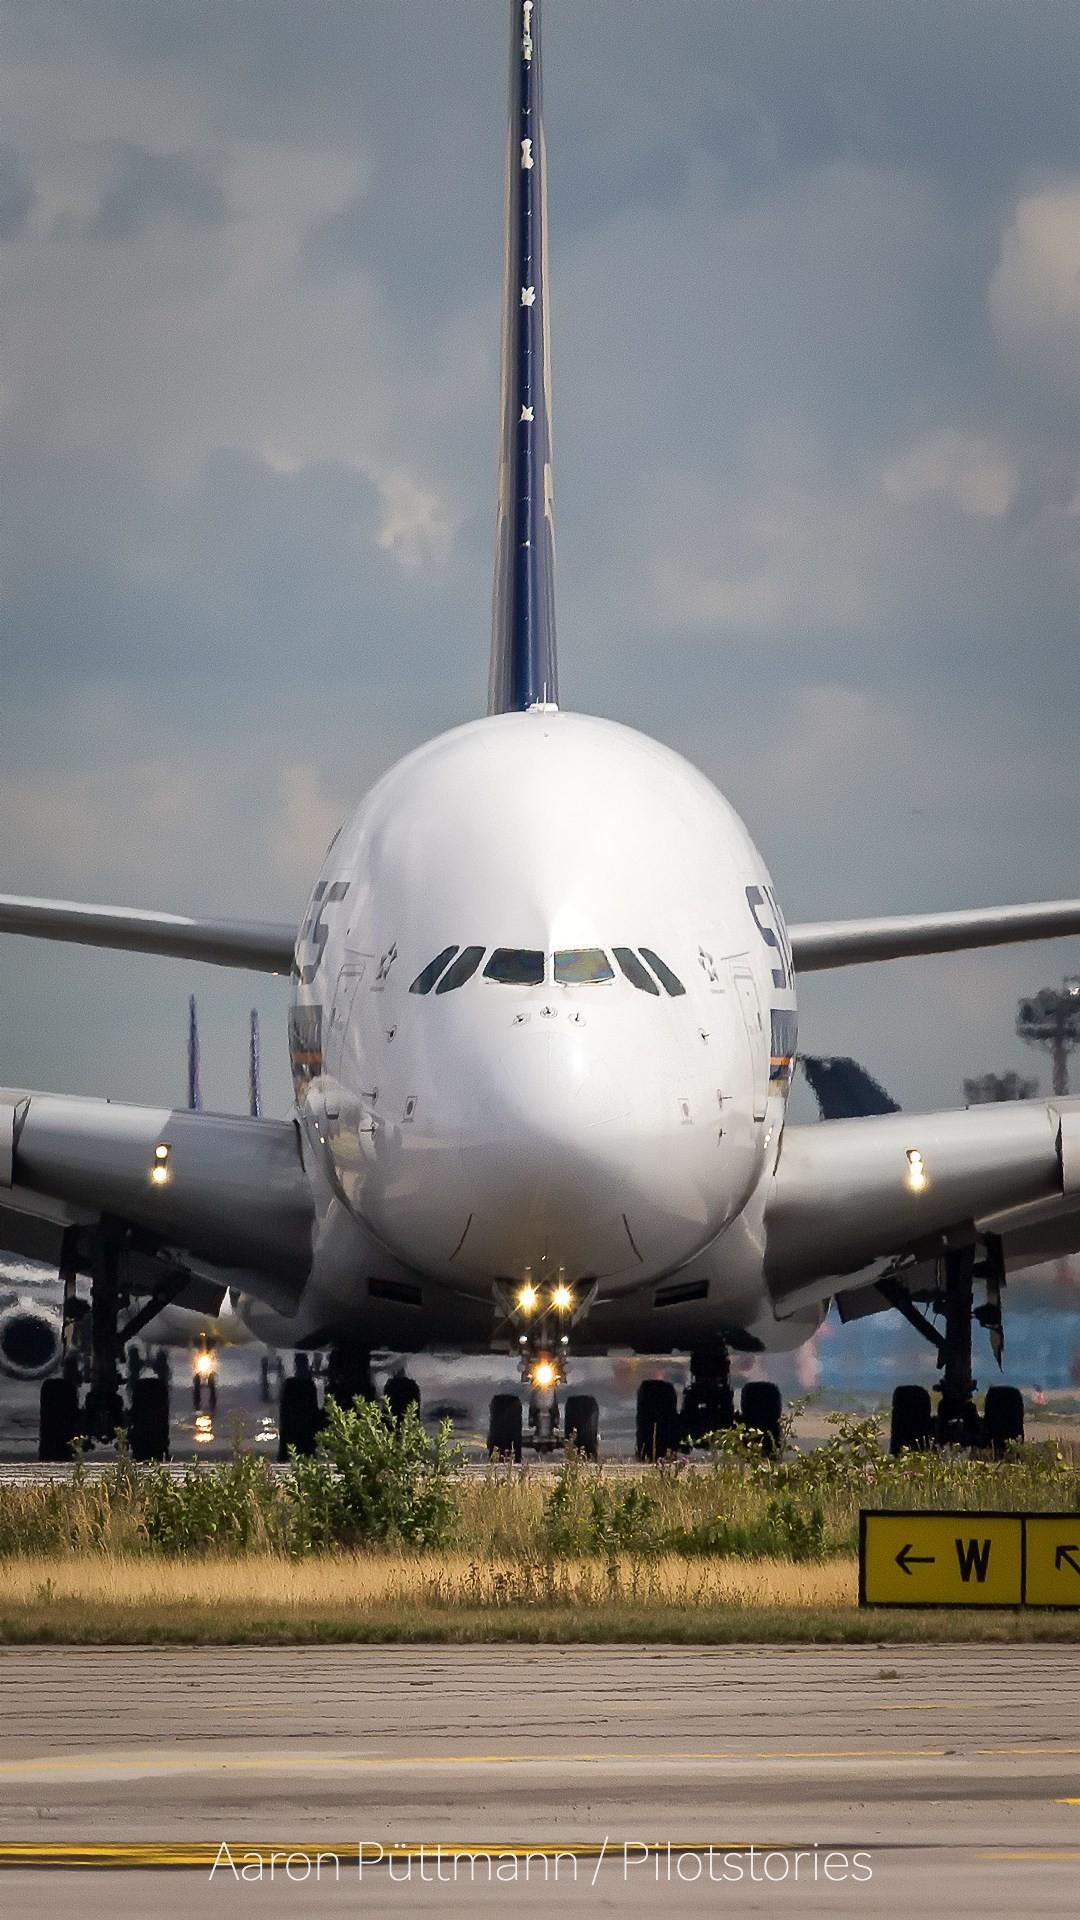 Full HD Singapore Airbus A380-800 Wallpaper Smartphone